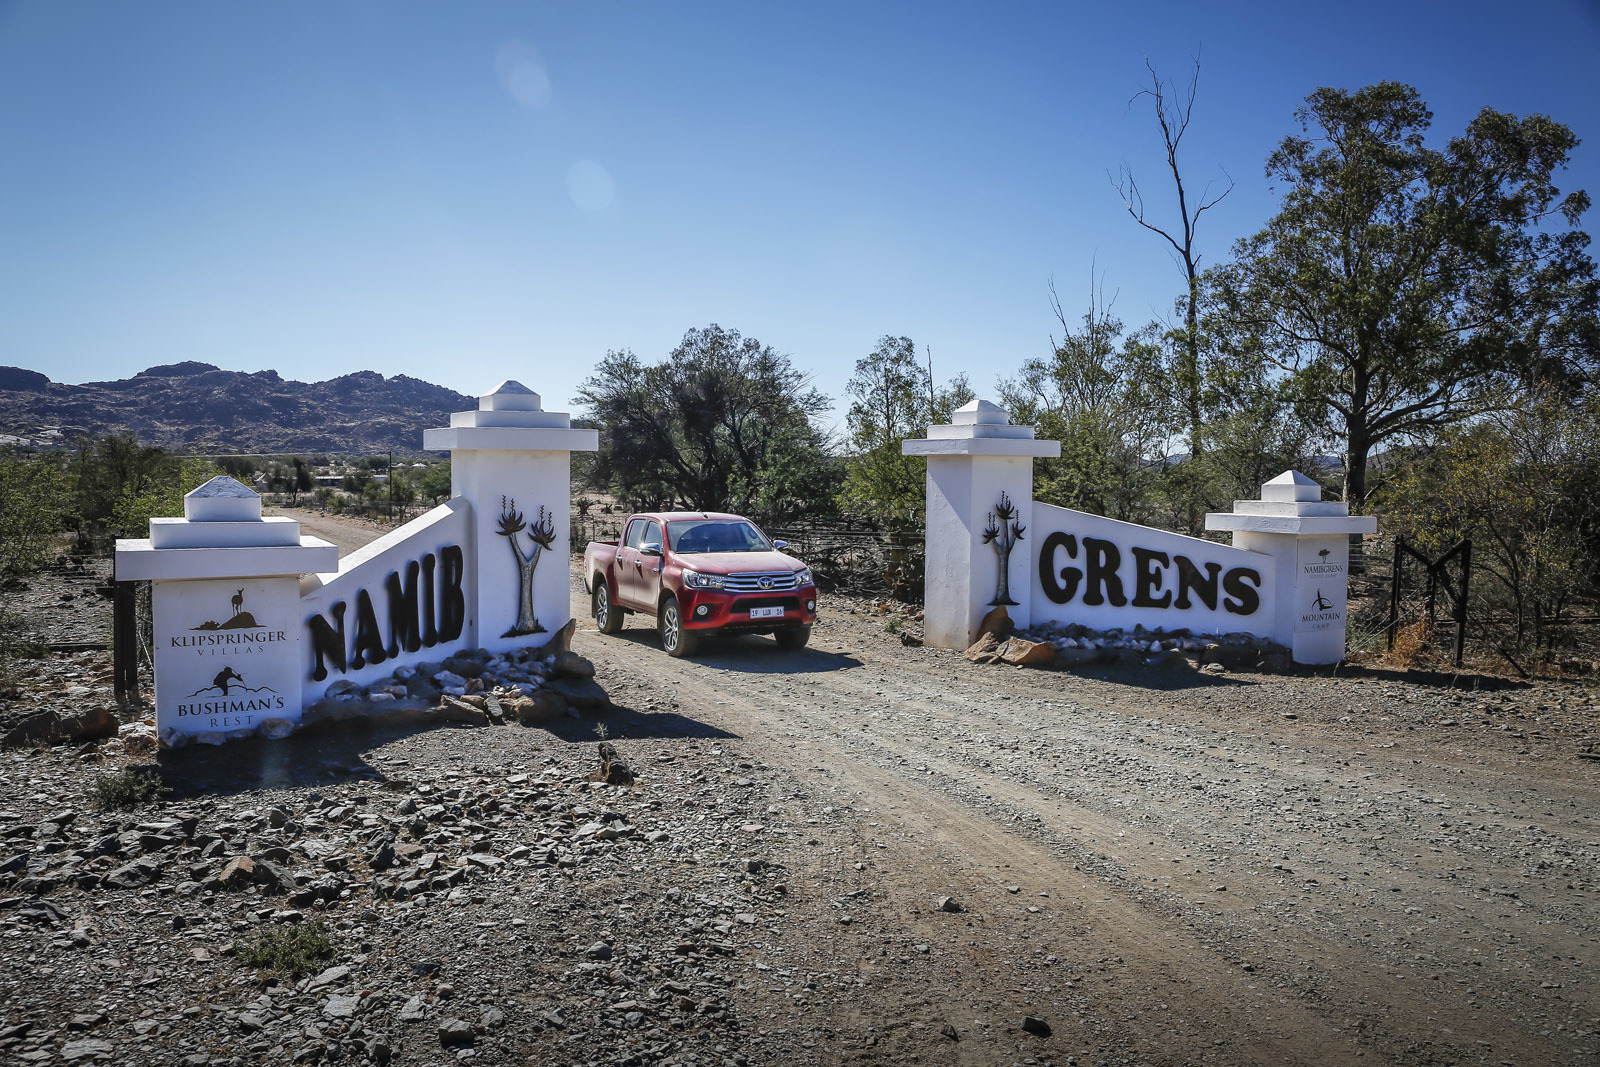 Toyota Hilux 2016 Namibia